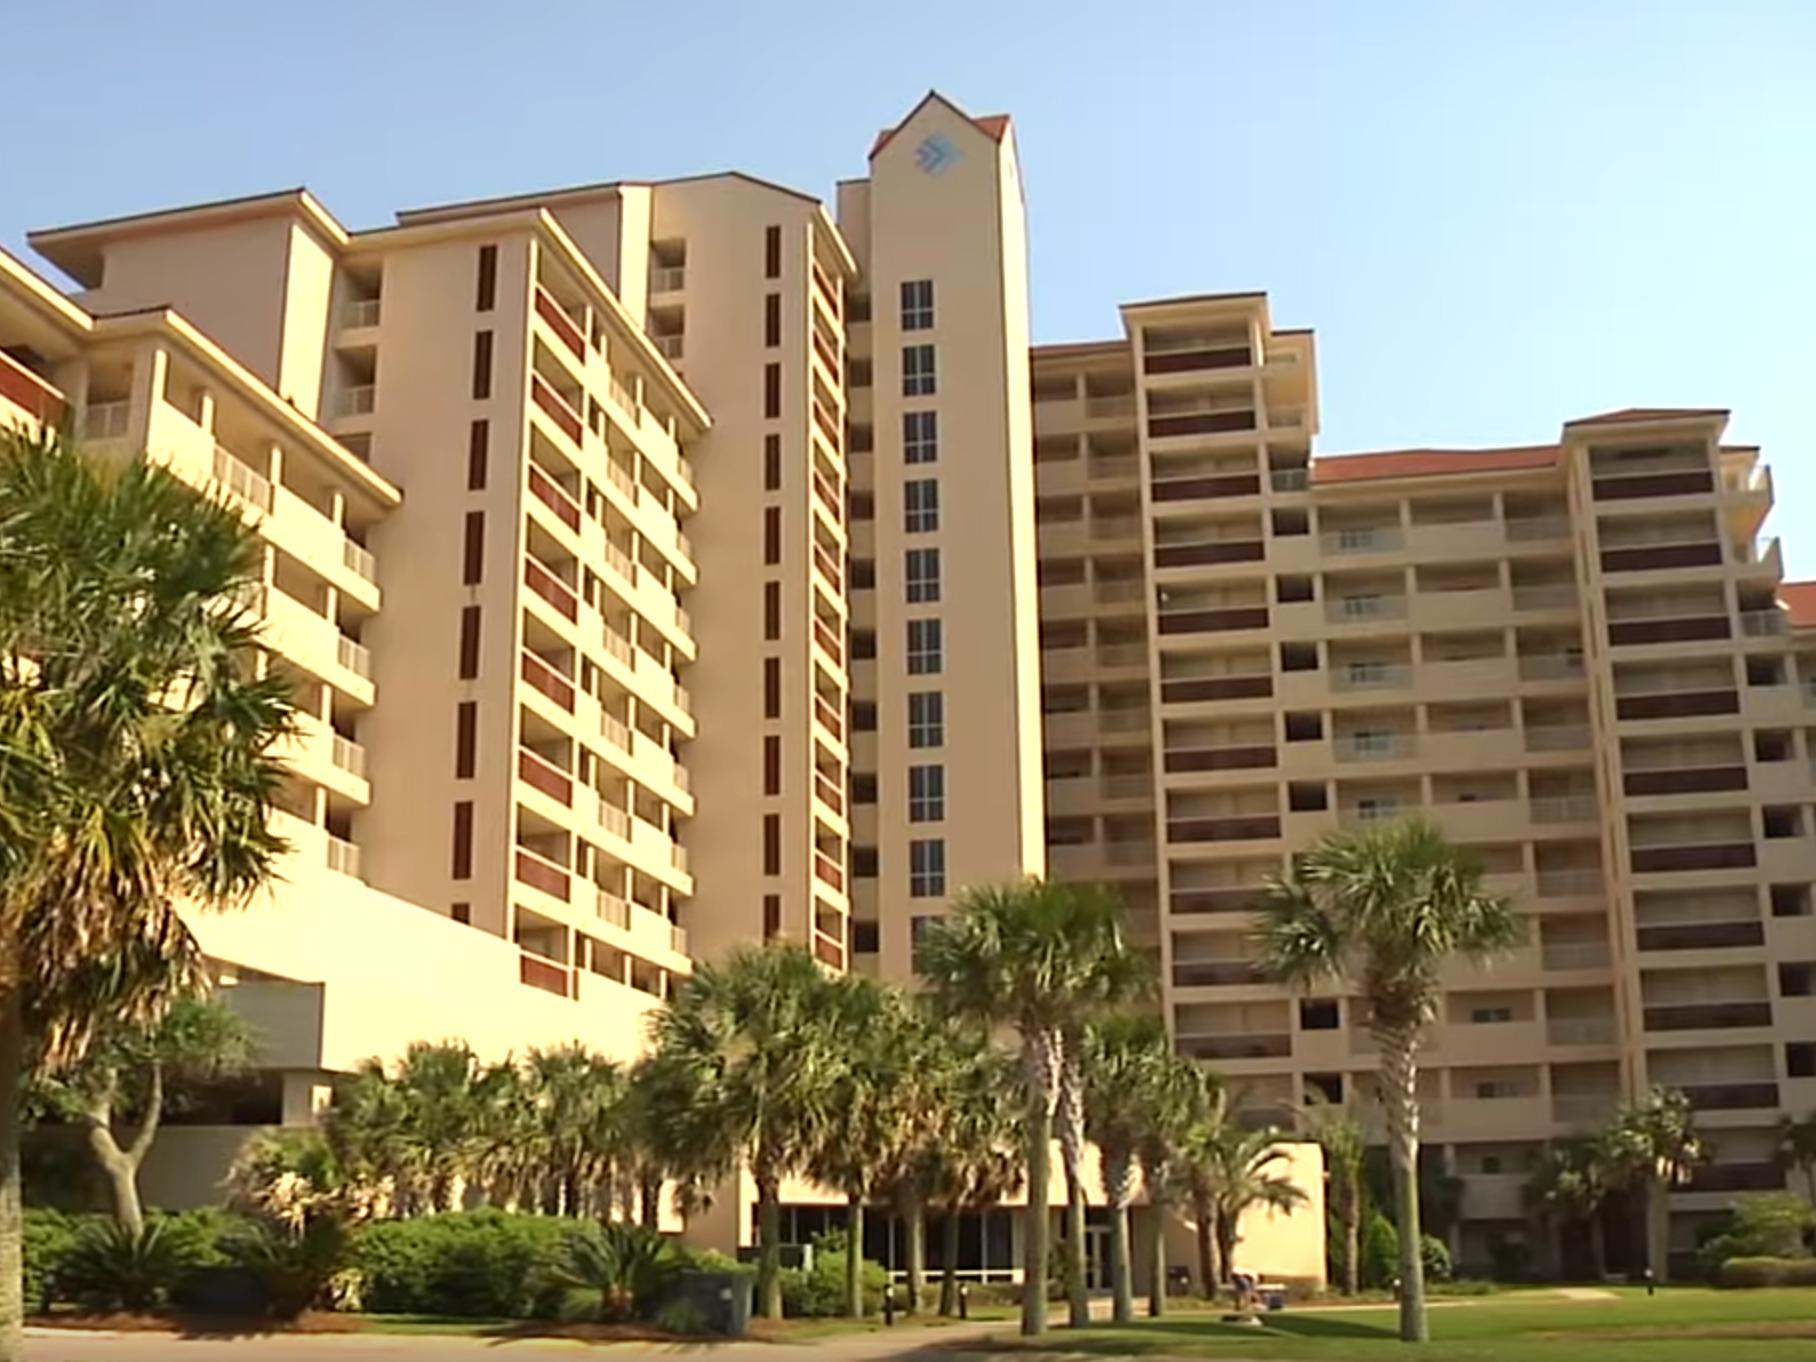 905 Tops'l Beach Manor Condo rental in TOPS'L Beach Manor  in Destin Florida - #24